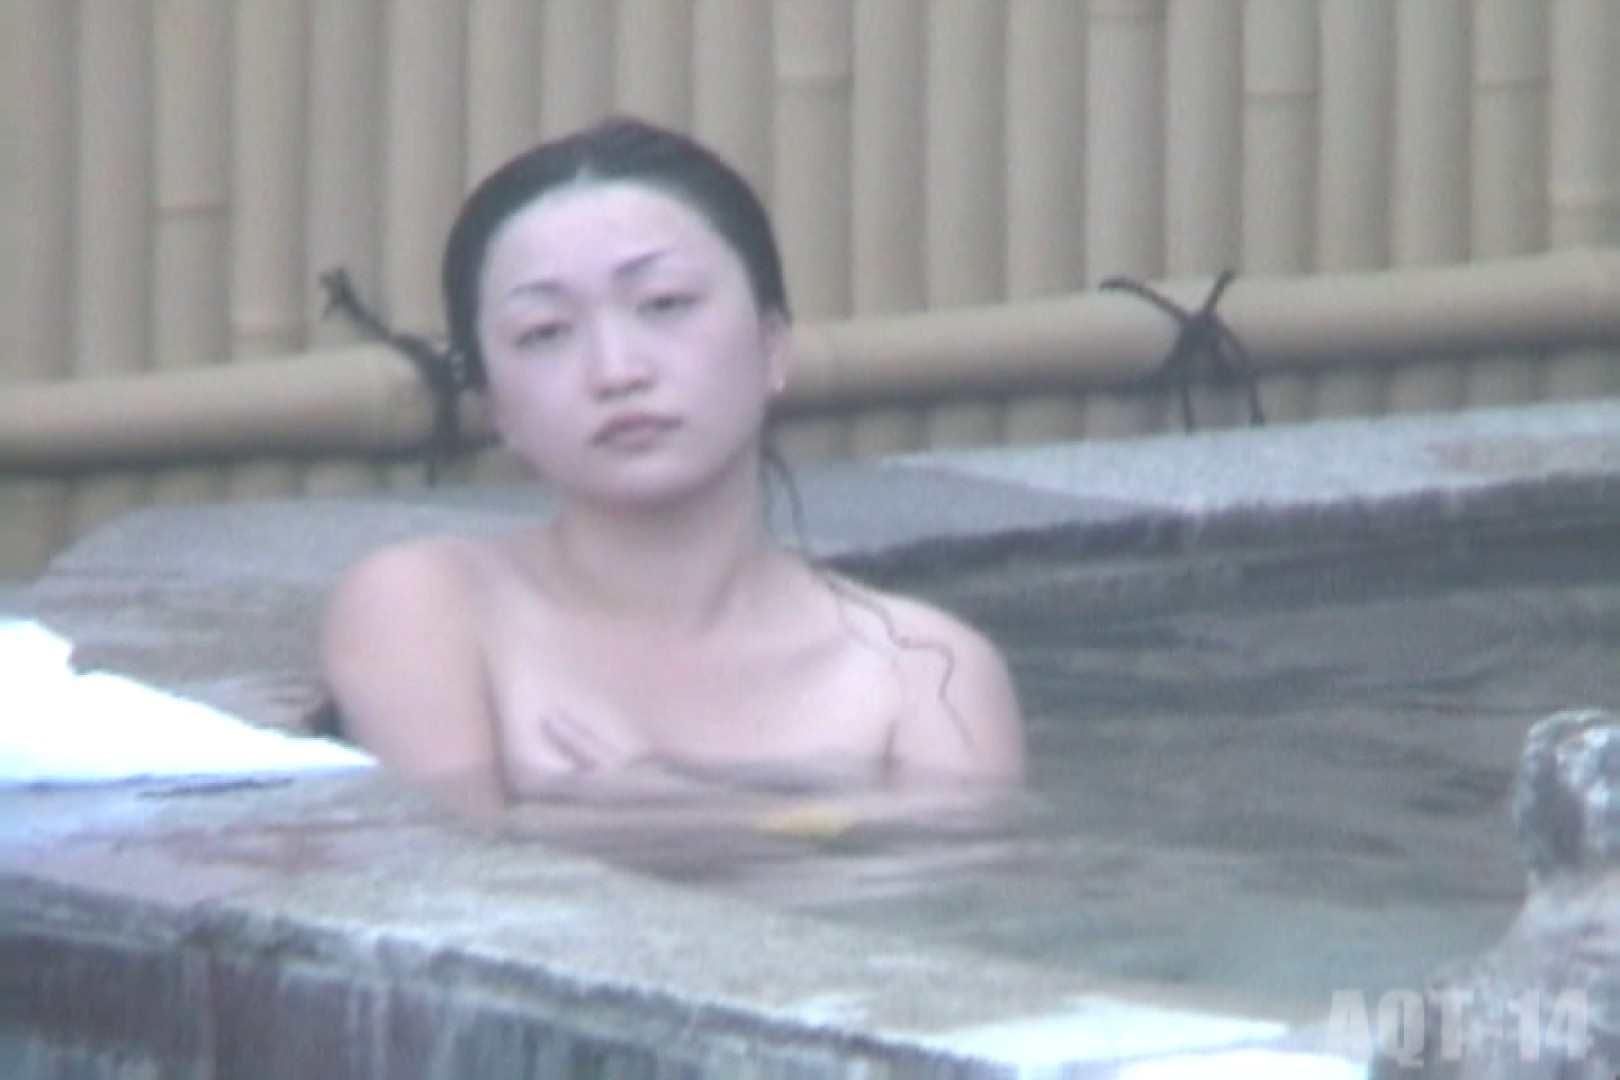 Aquaな露天風呂Vol.826 盗撮  84連発 4